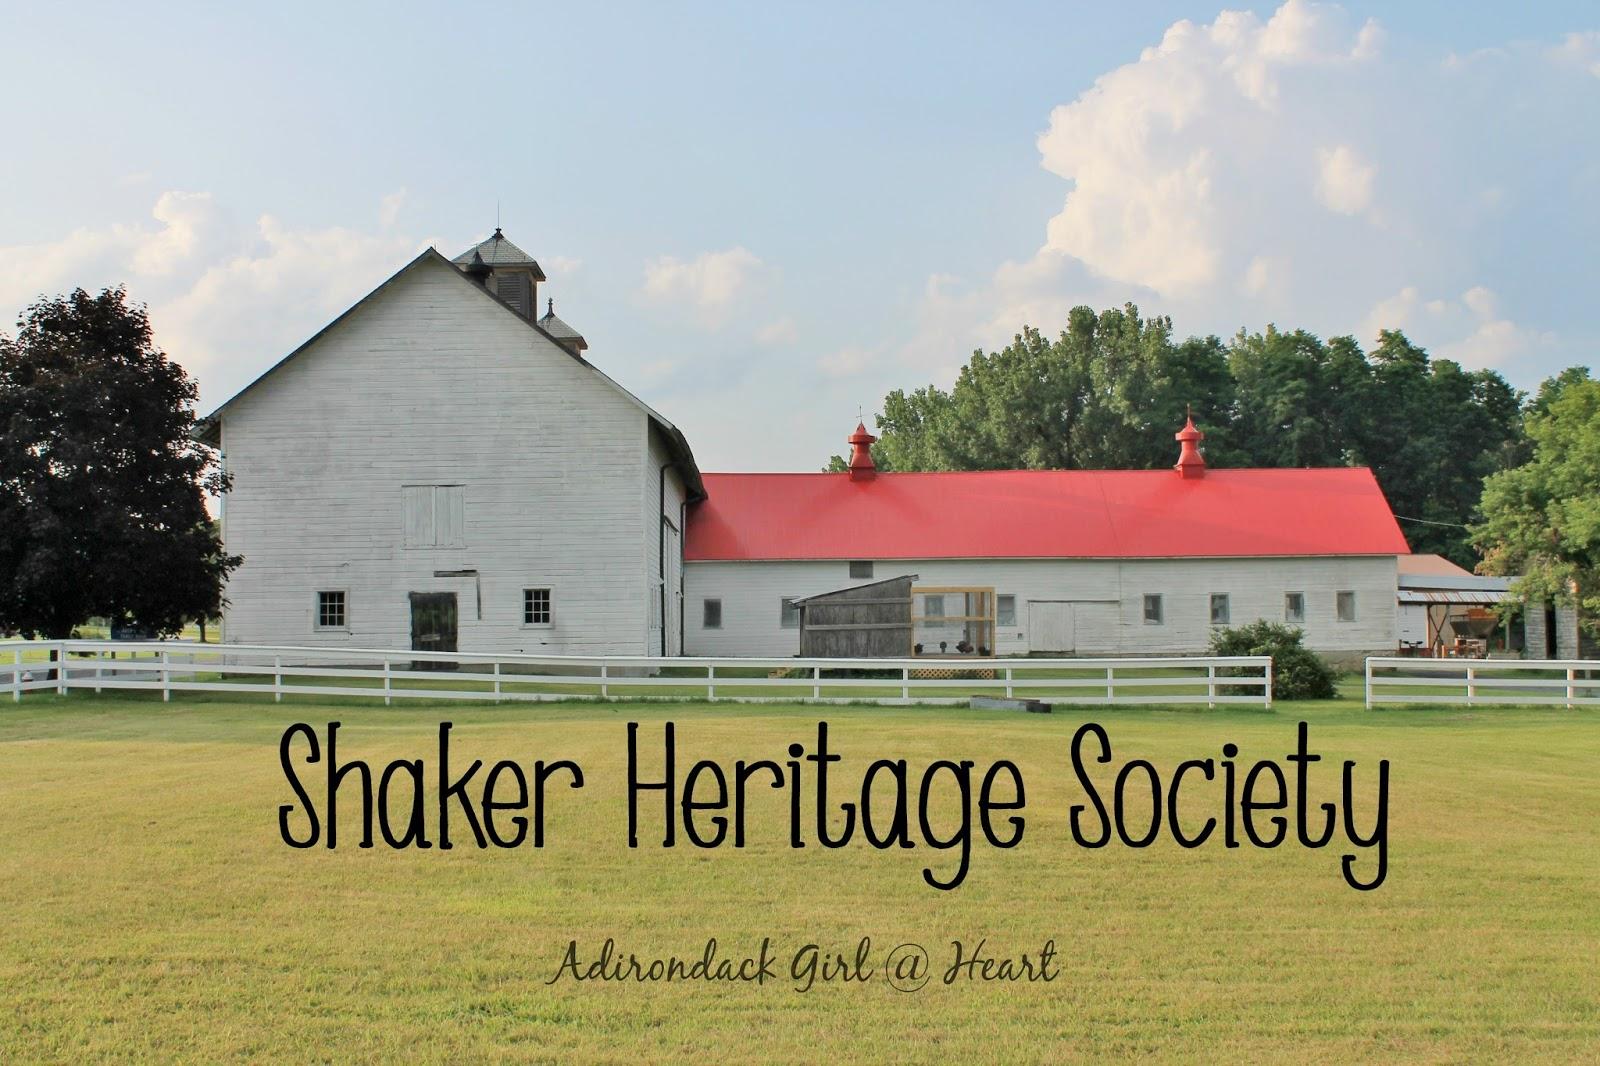 The Shaker Heritage Society